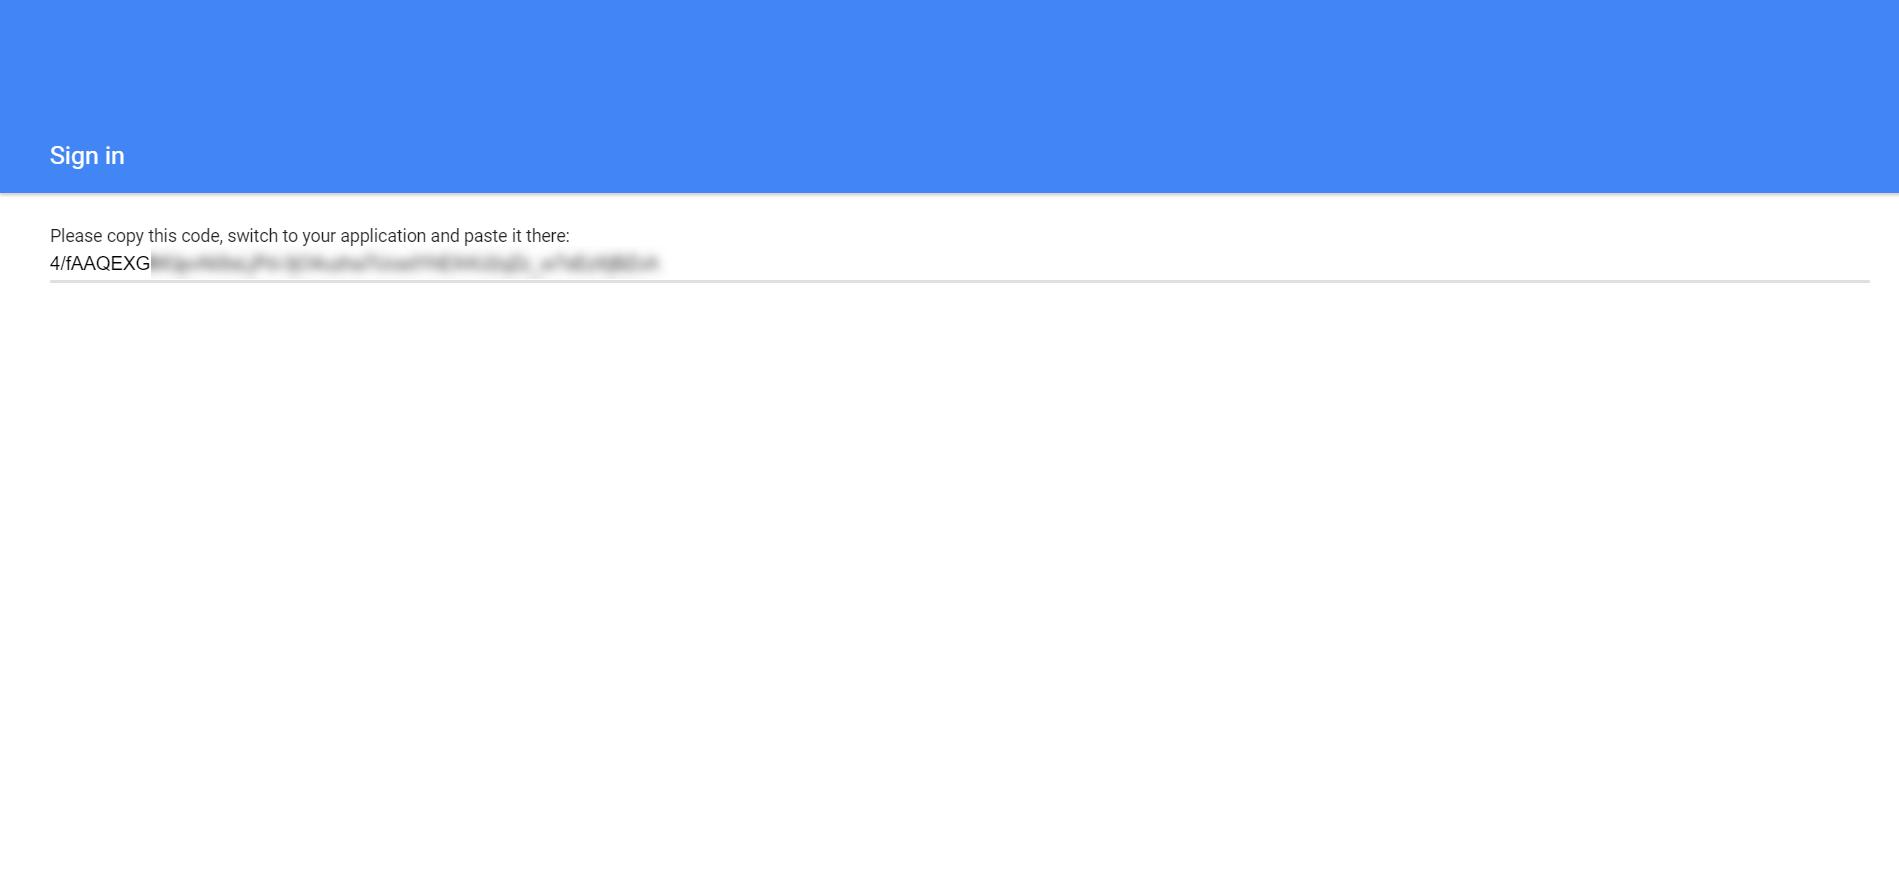 Configure Google Analytics Dashboard for WP 6